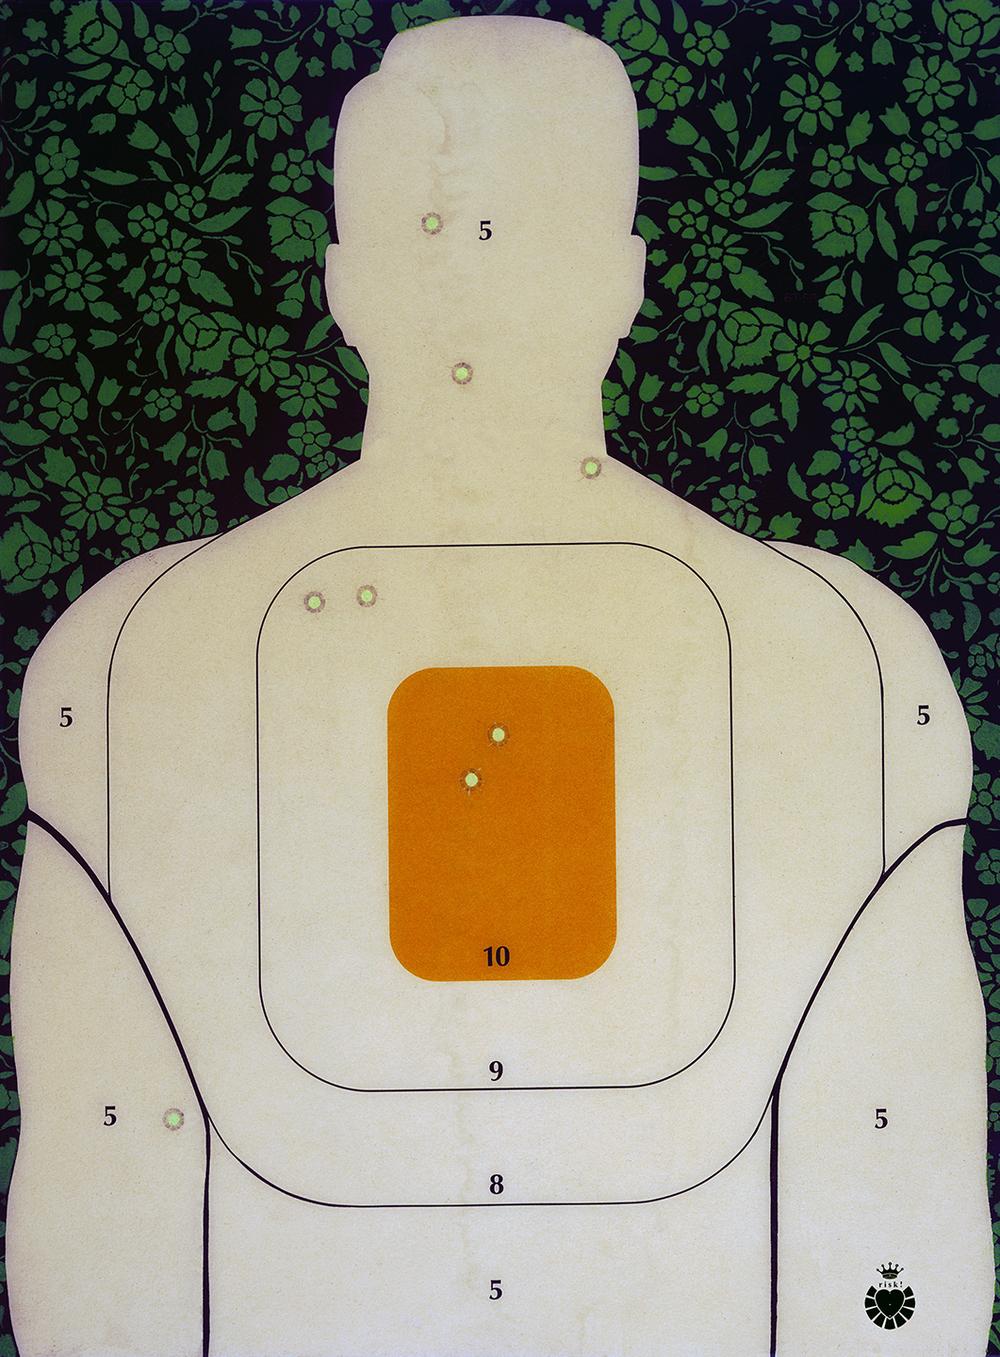 Hank's Training Target / 24 x 18